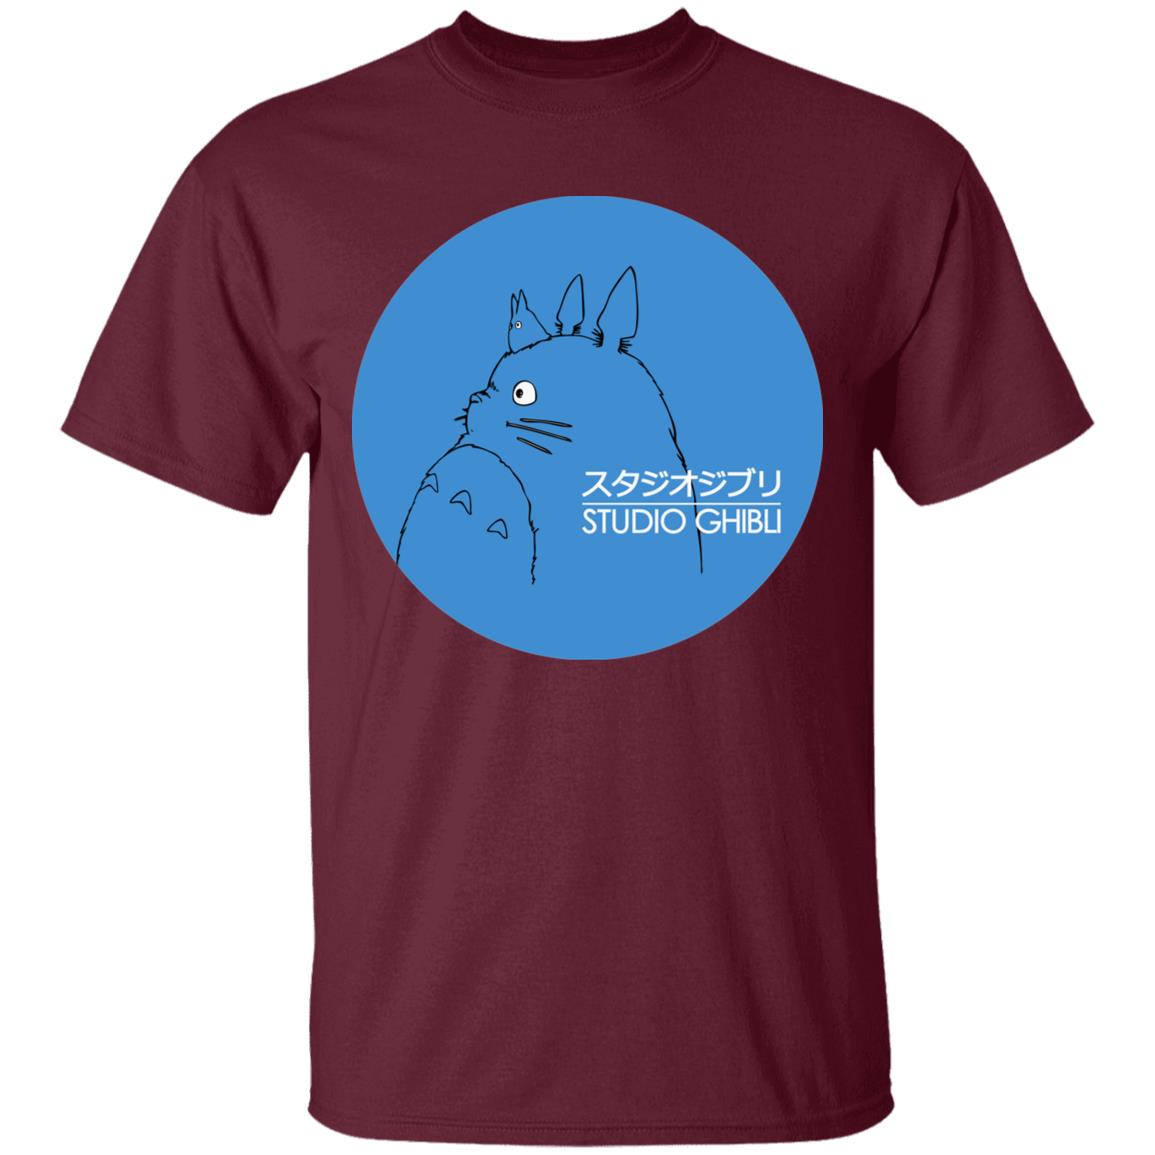 Studio Ghibli Logo T Shirt Unisex